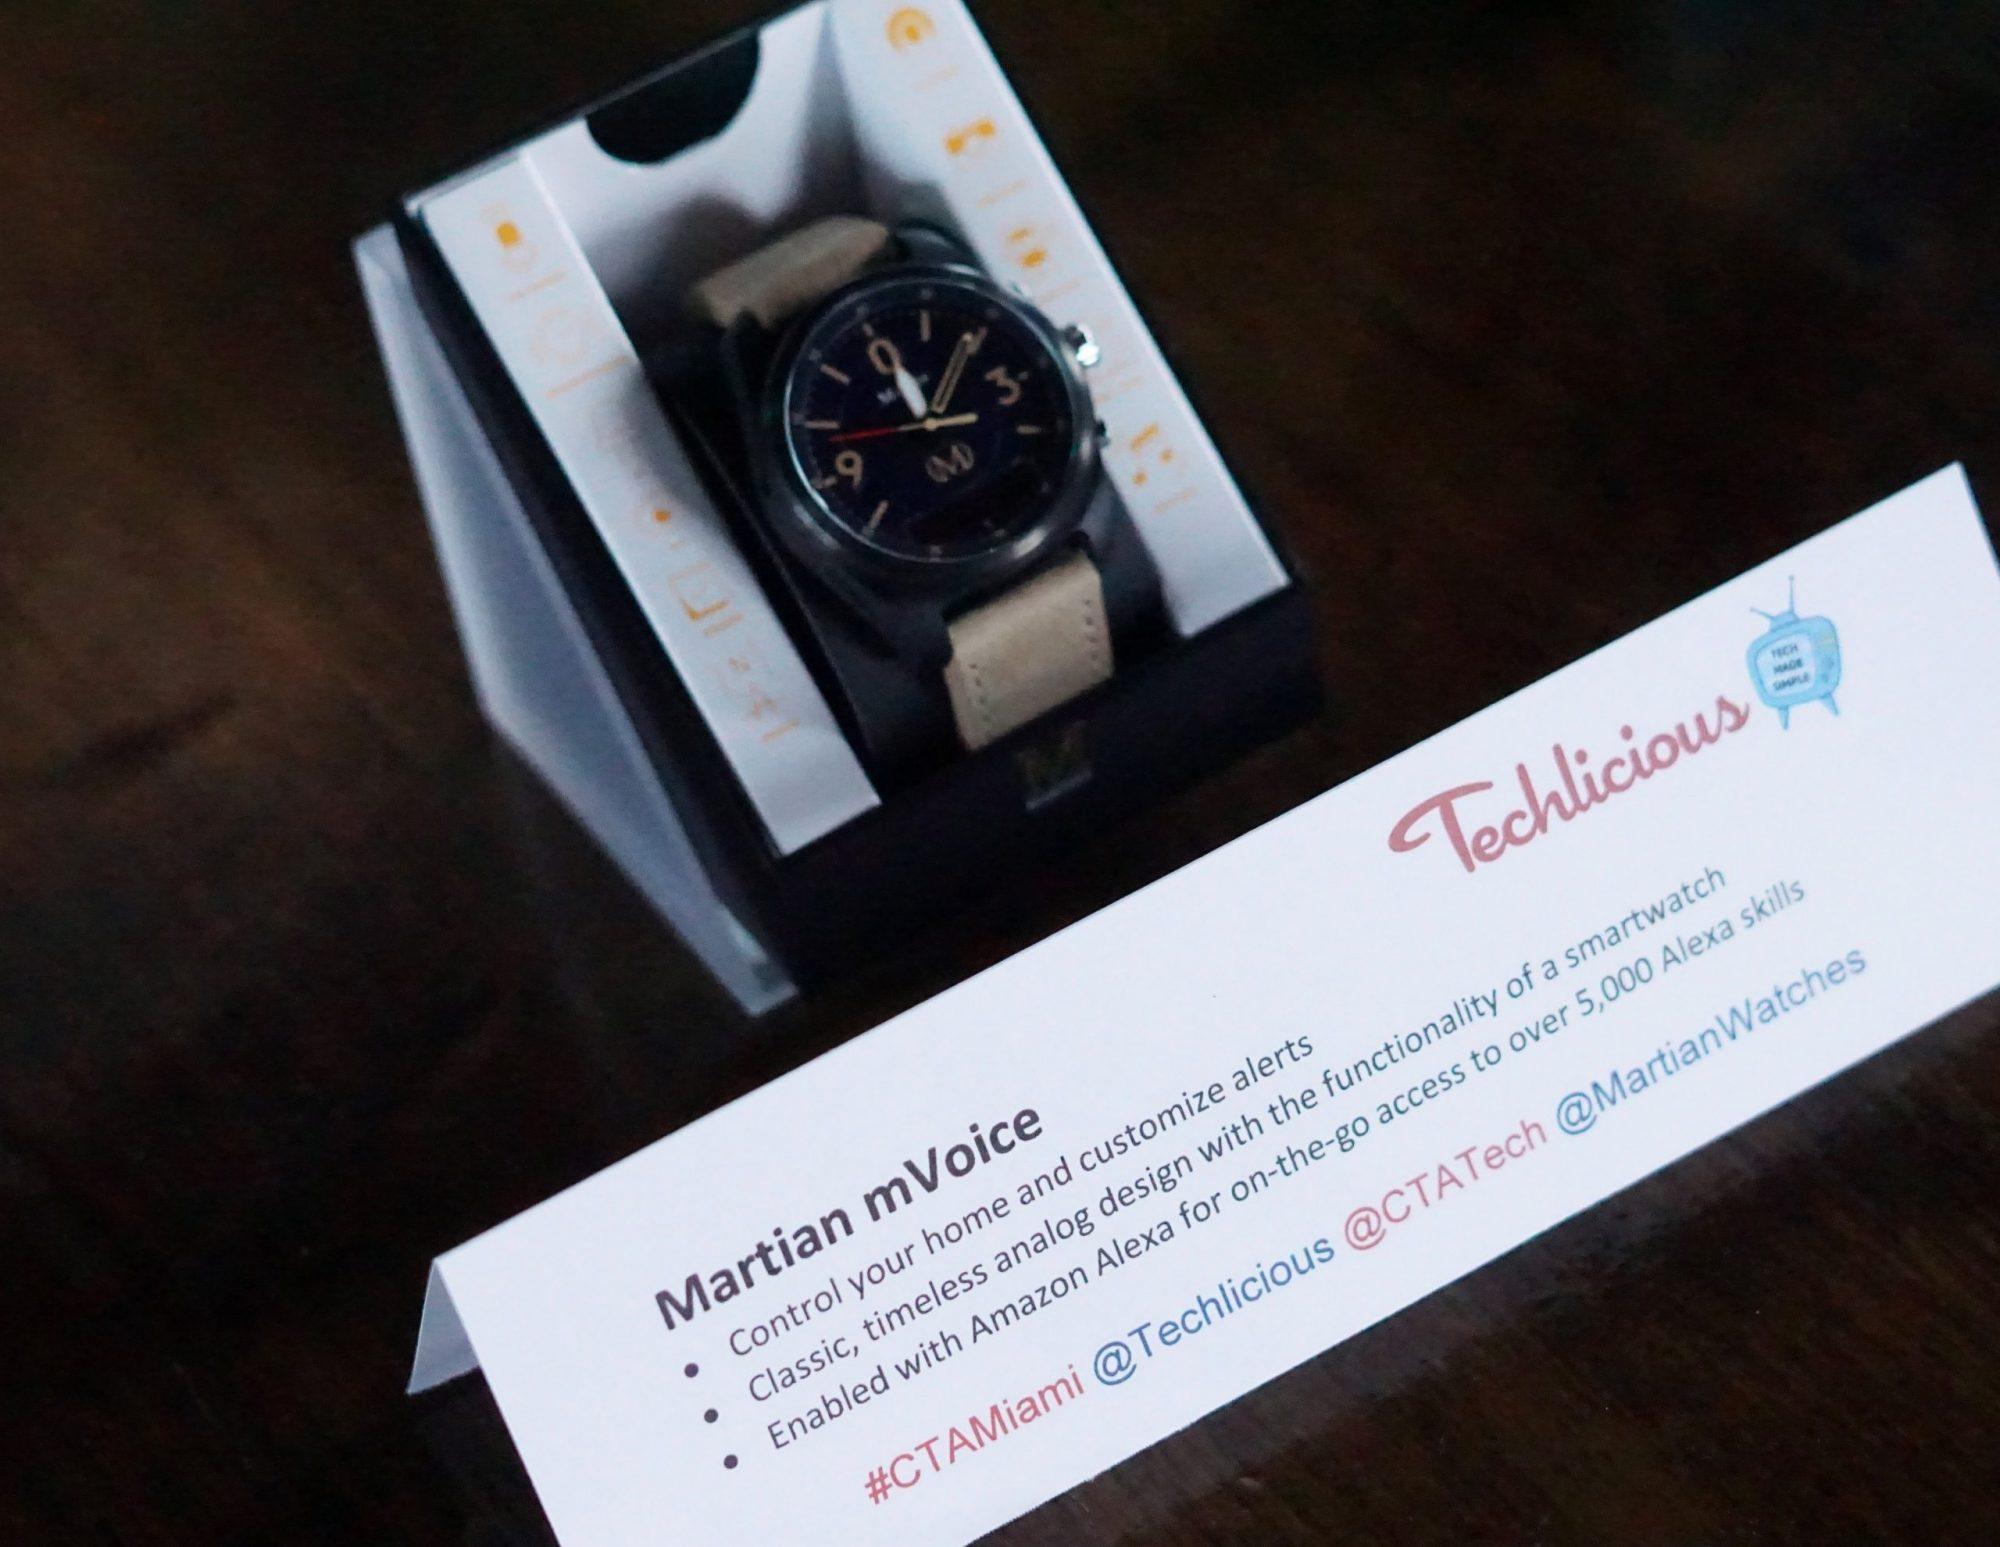 artian mVoice Smartwatches with Amazon Alexa